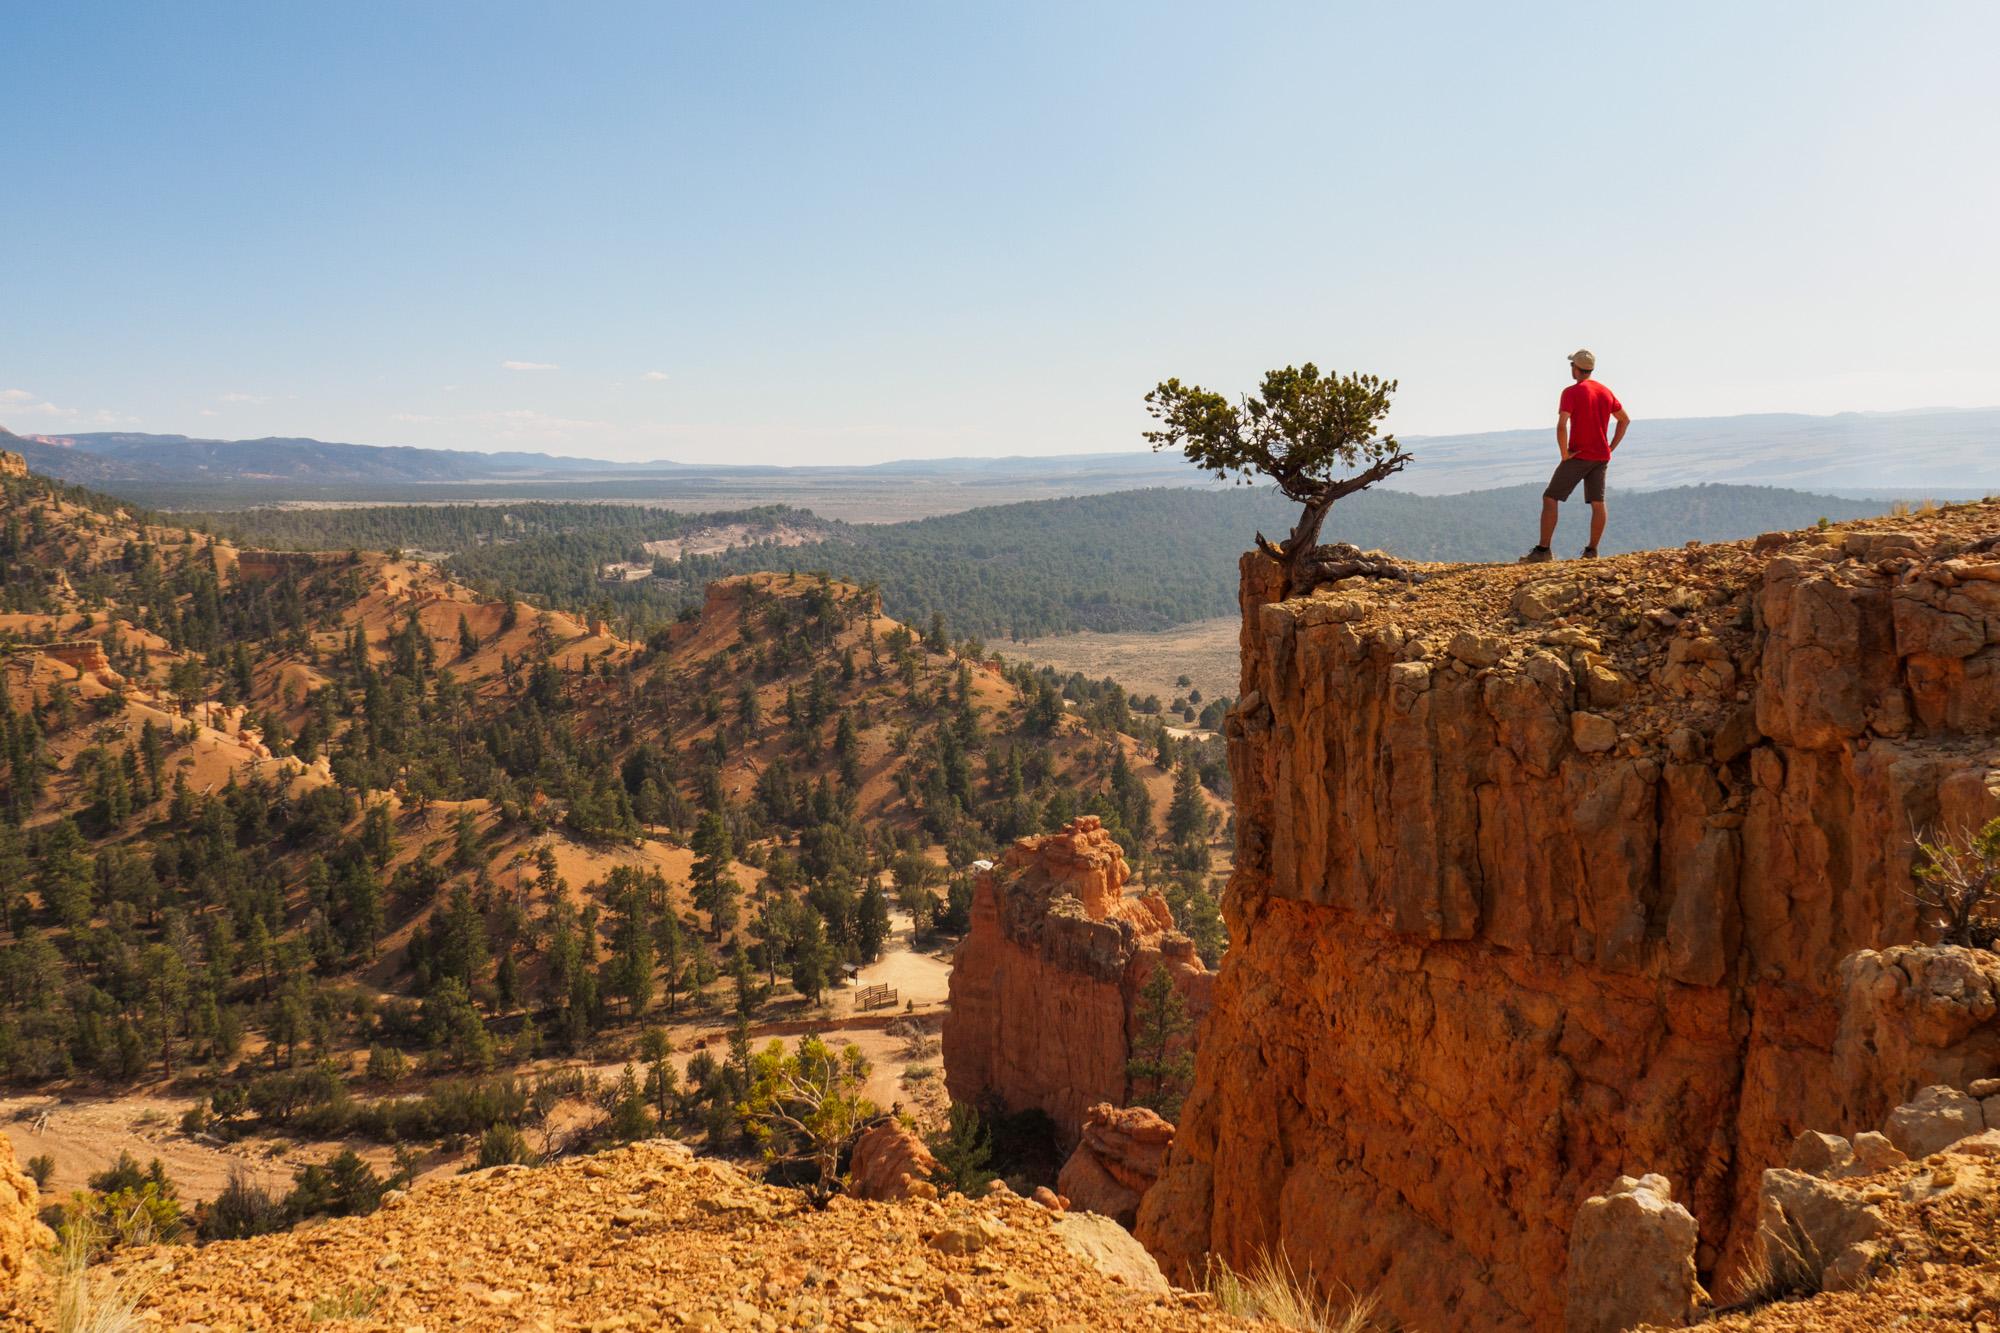 Red Canyon - Aussicht vom Arches Trail auf das Colorado Plateau